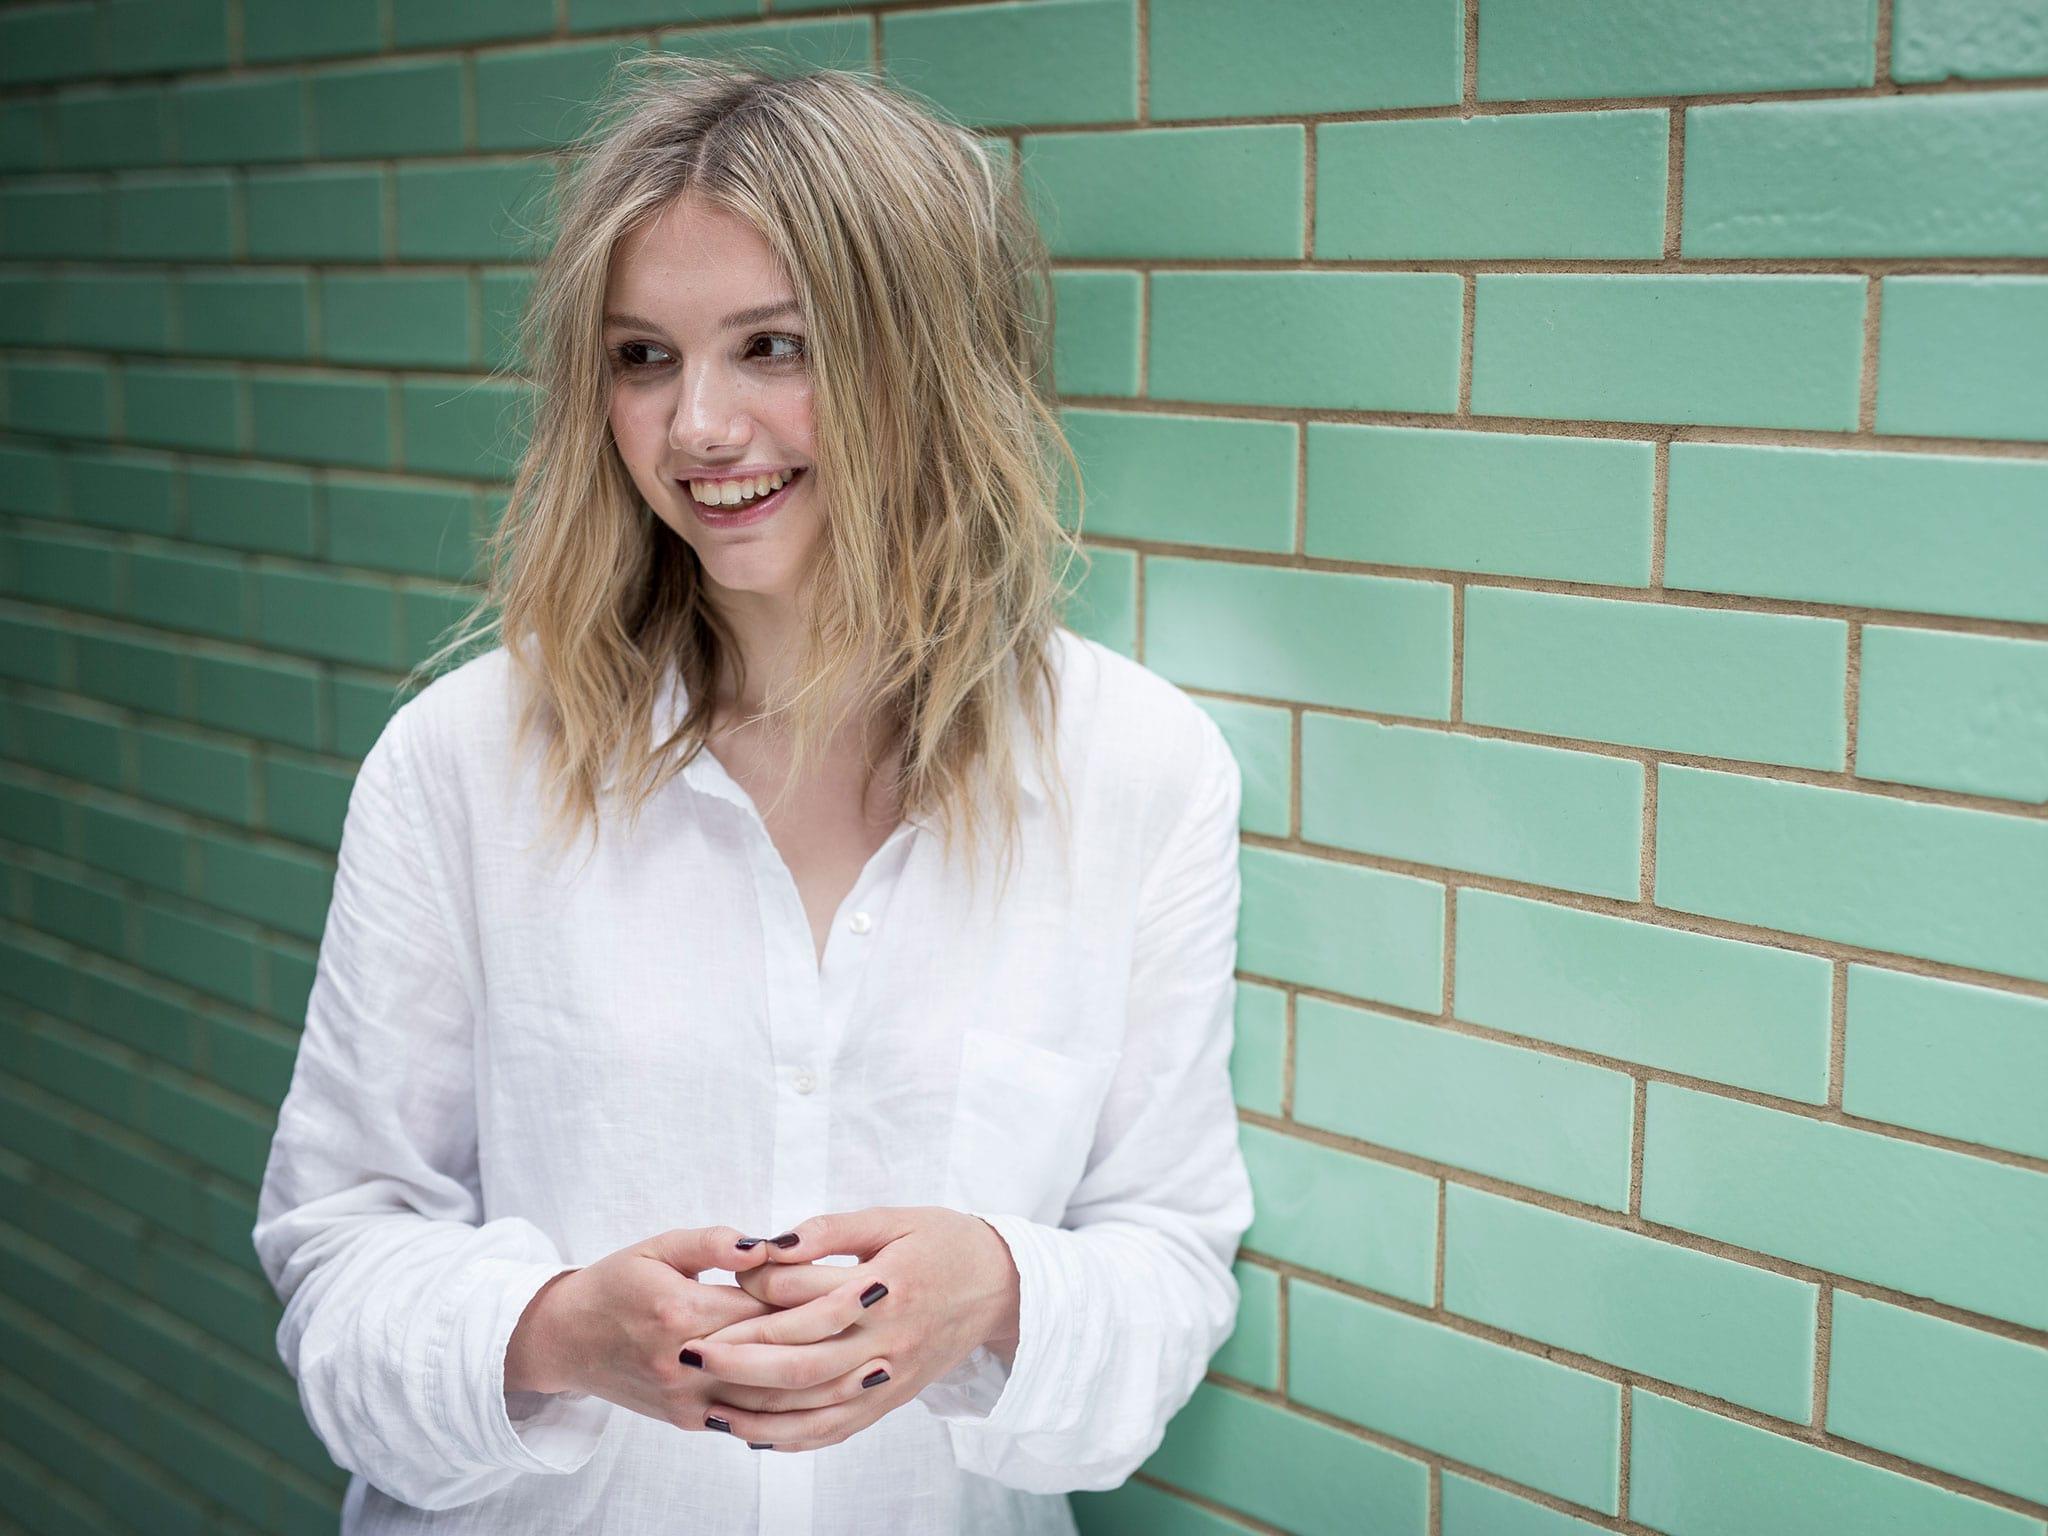 Hannah Murray widescreen wallpapers